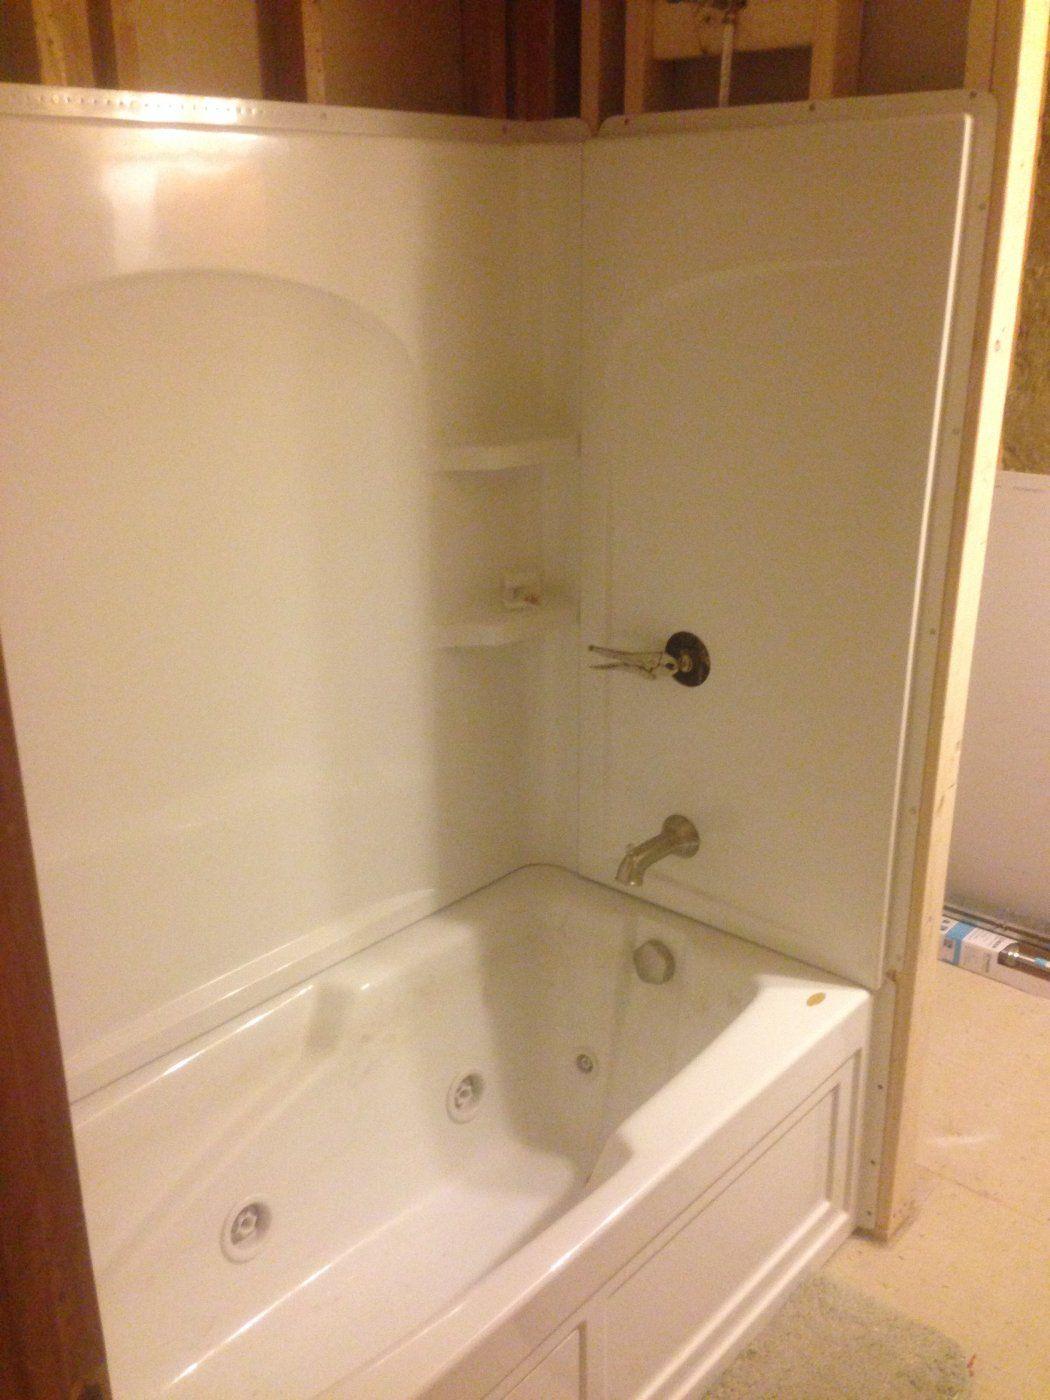 Caulkless Interlocking Tub Surround vs Swanstone? Does the caulkless ...